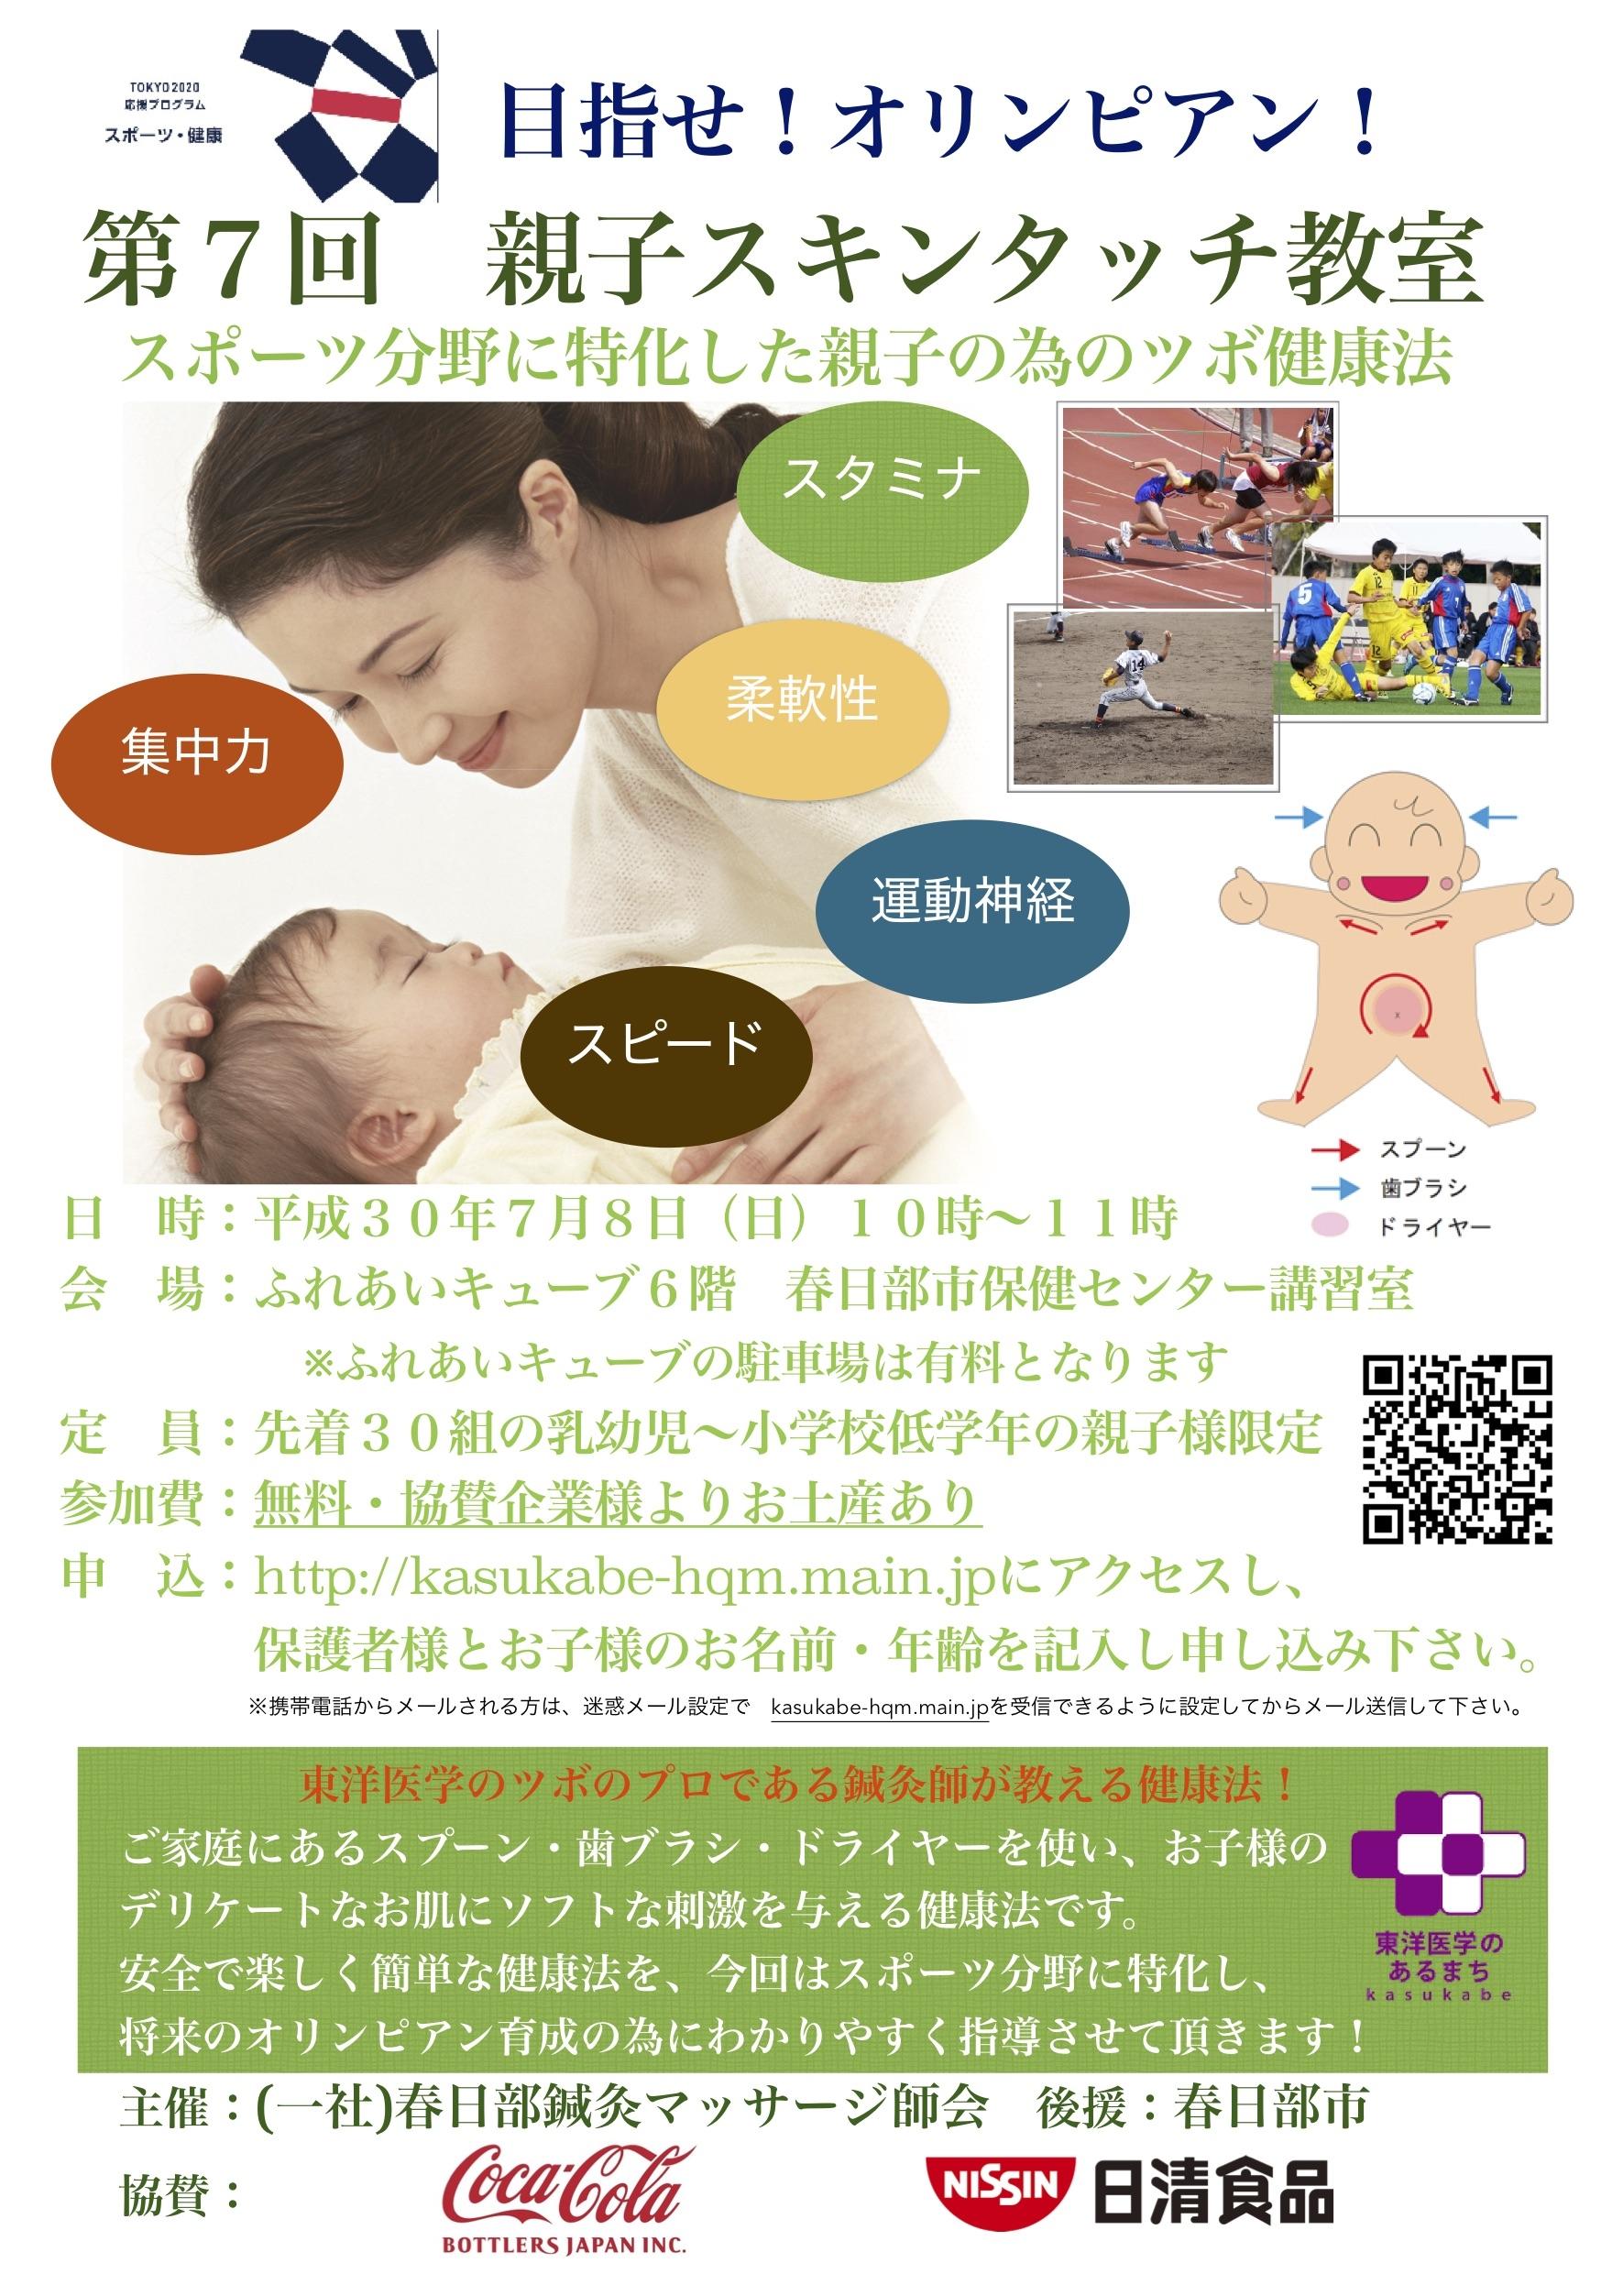 親子スキンタッチ教室、小児鍼、鍼灸、春日部、埼玉県